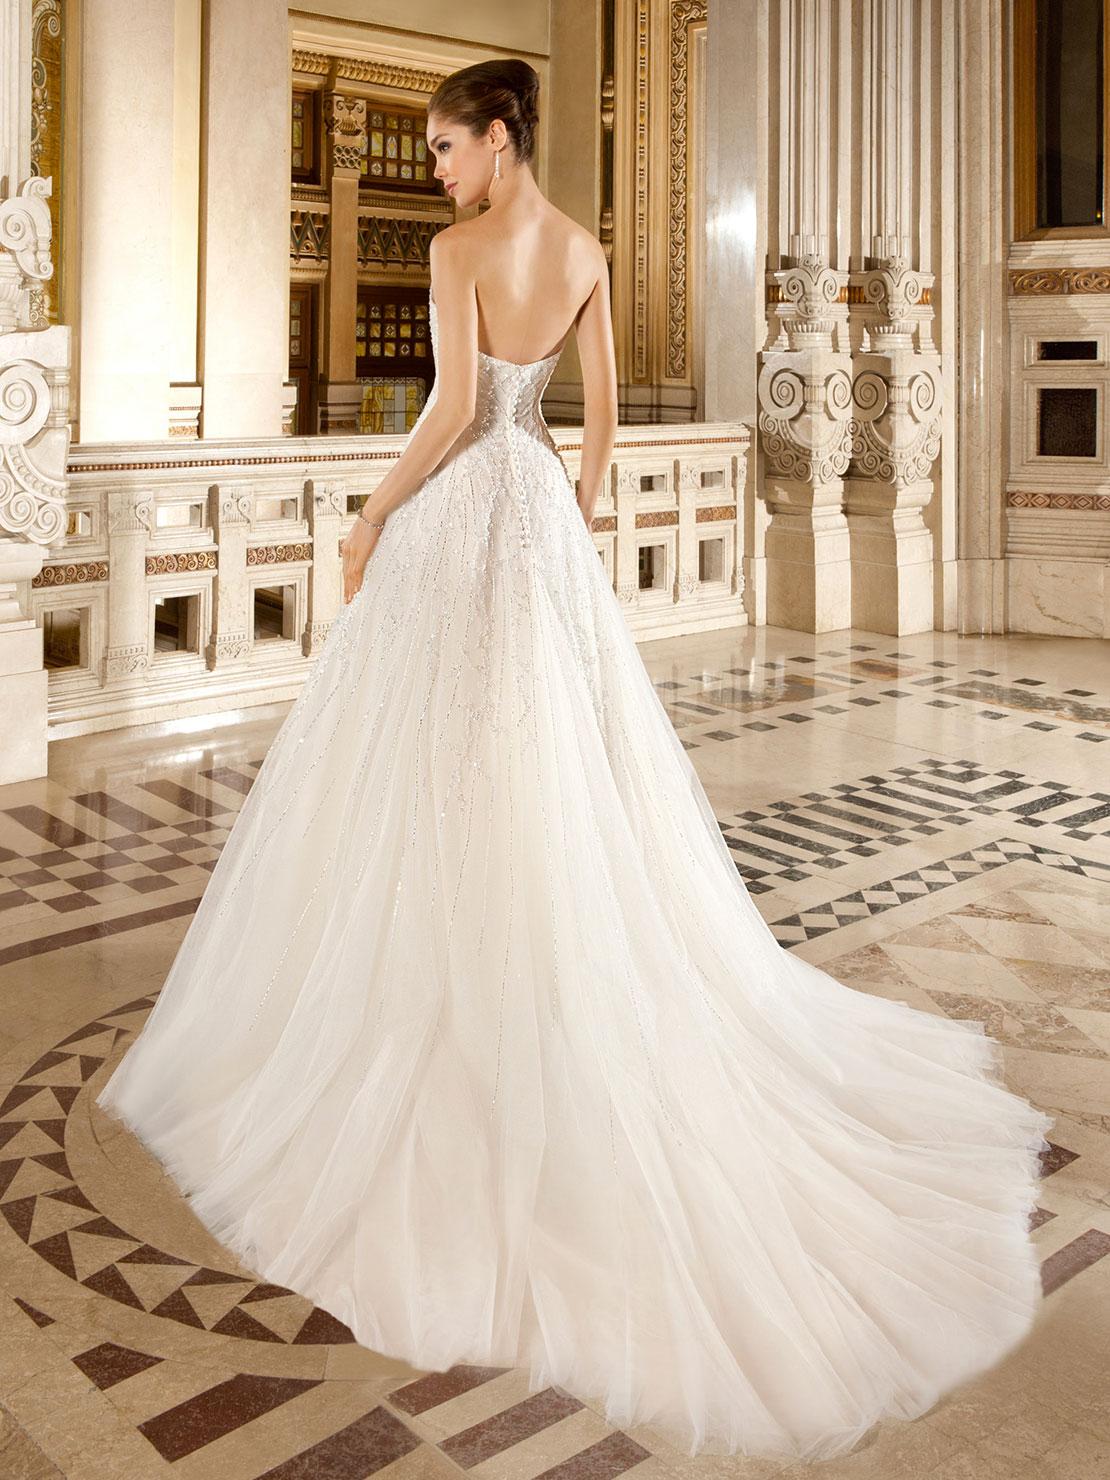 db7b91aad2d Modele robe mariage 2015 les robe dentelle 2016